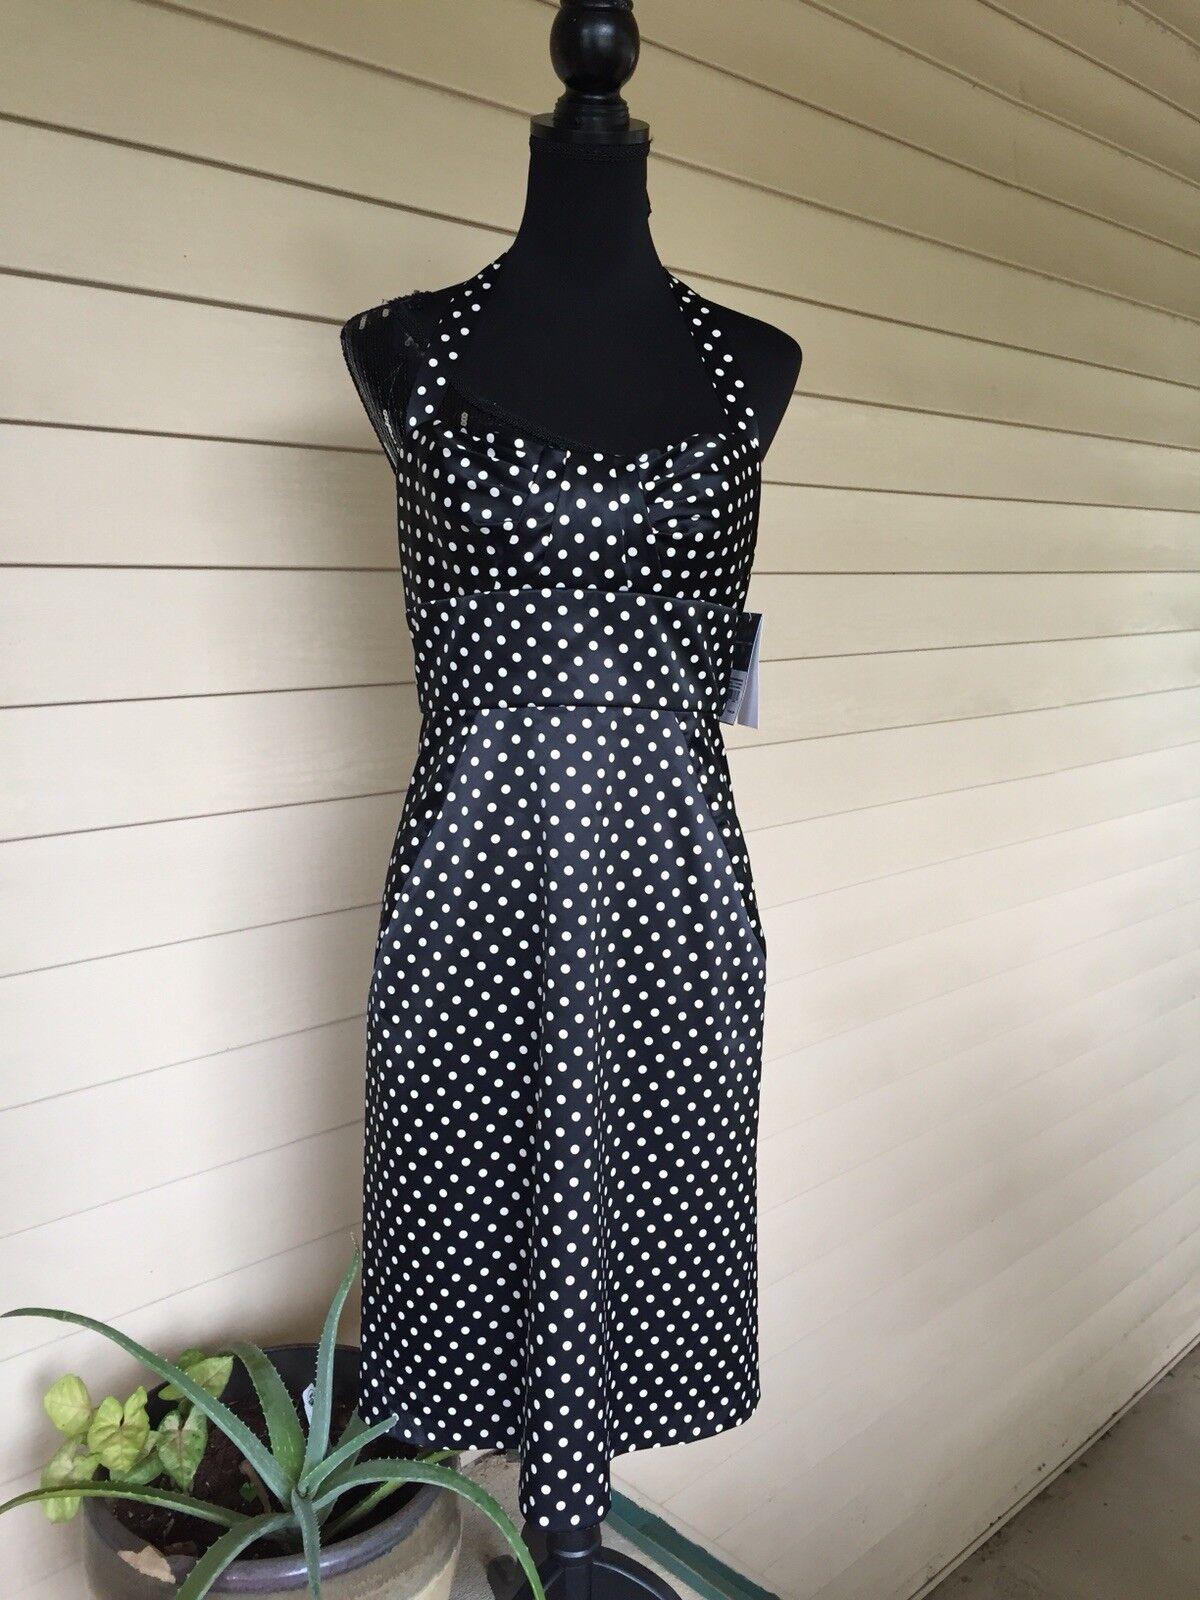 605d47ed776898 damen Ricco schwarz Polka Dot Dress Größe 8 Halter nohmhv3166 ...